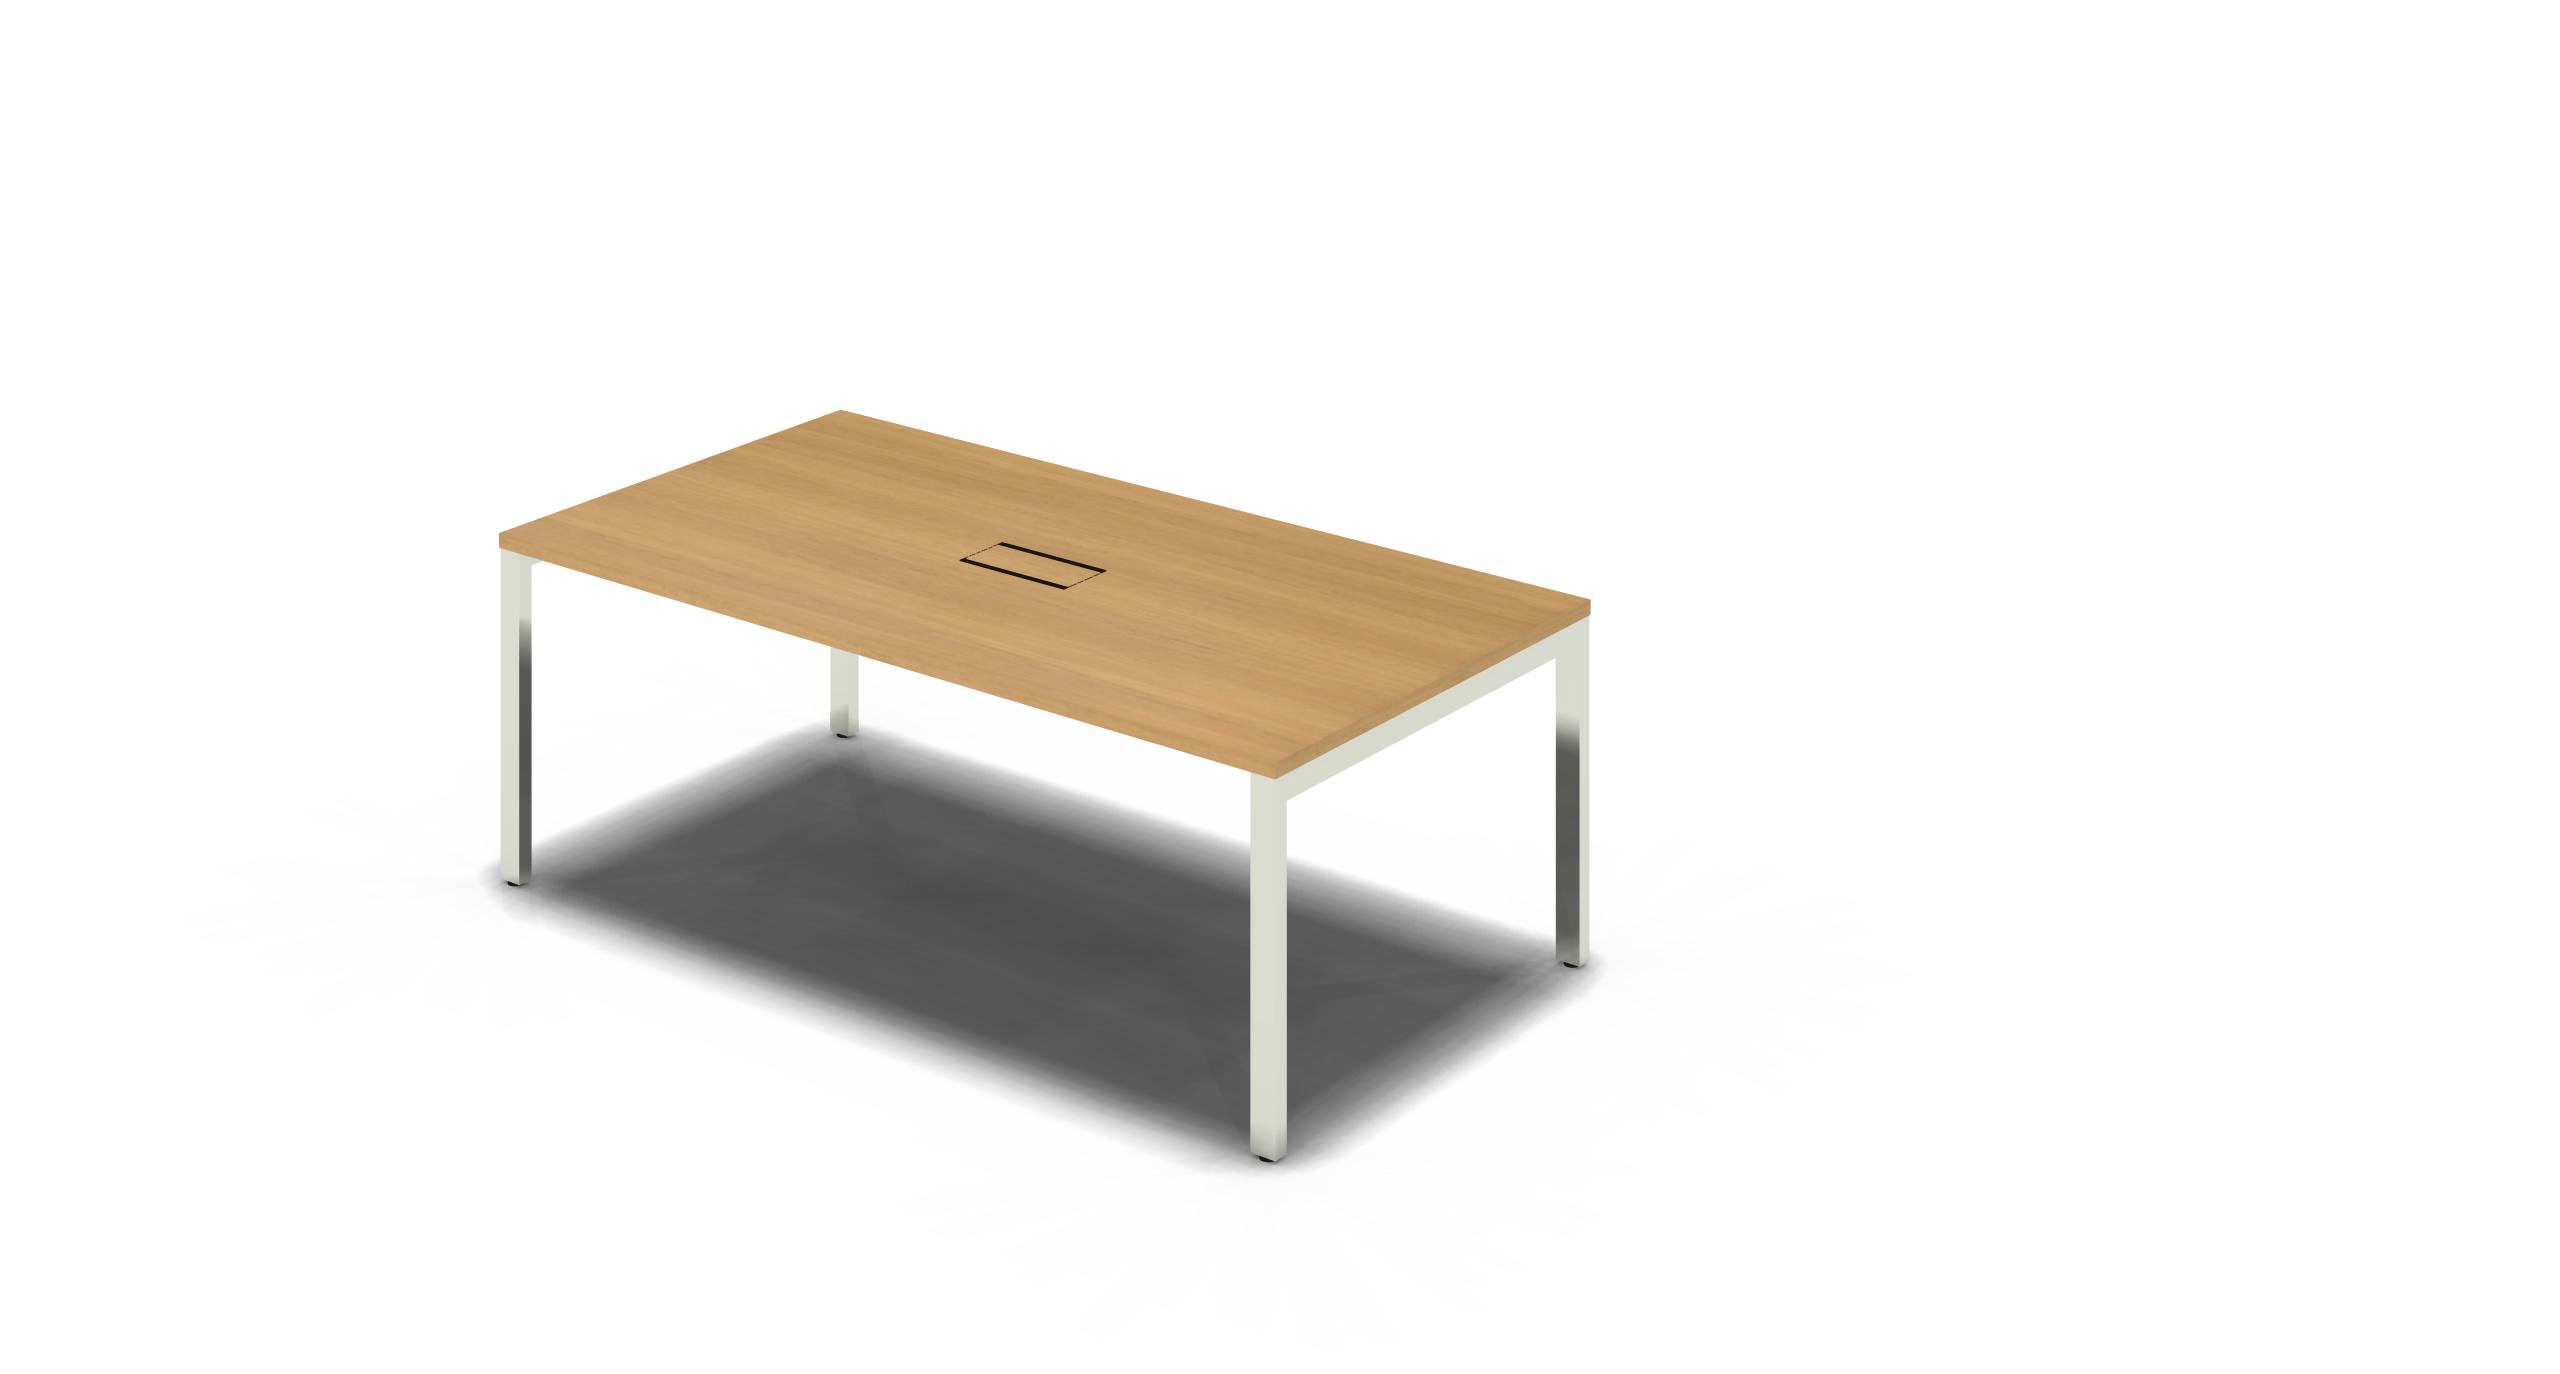 Table_Square_1800x900_Chrome_Oak_withOption